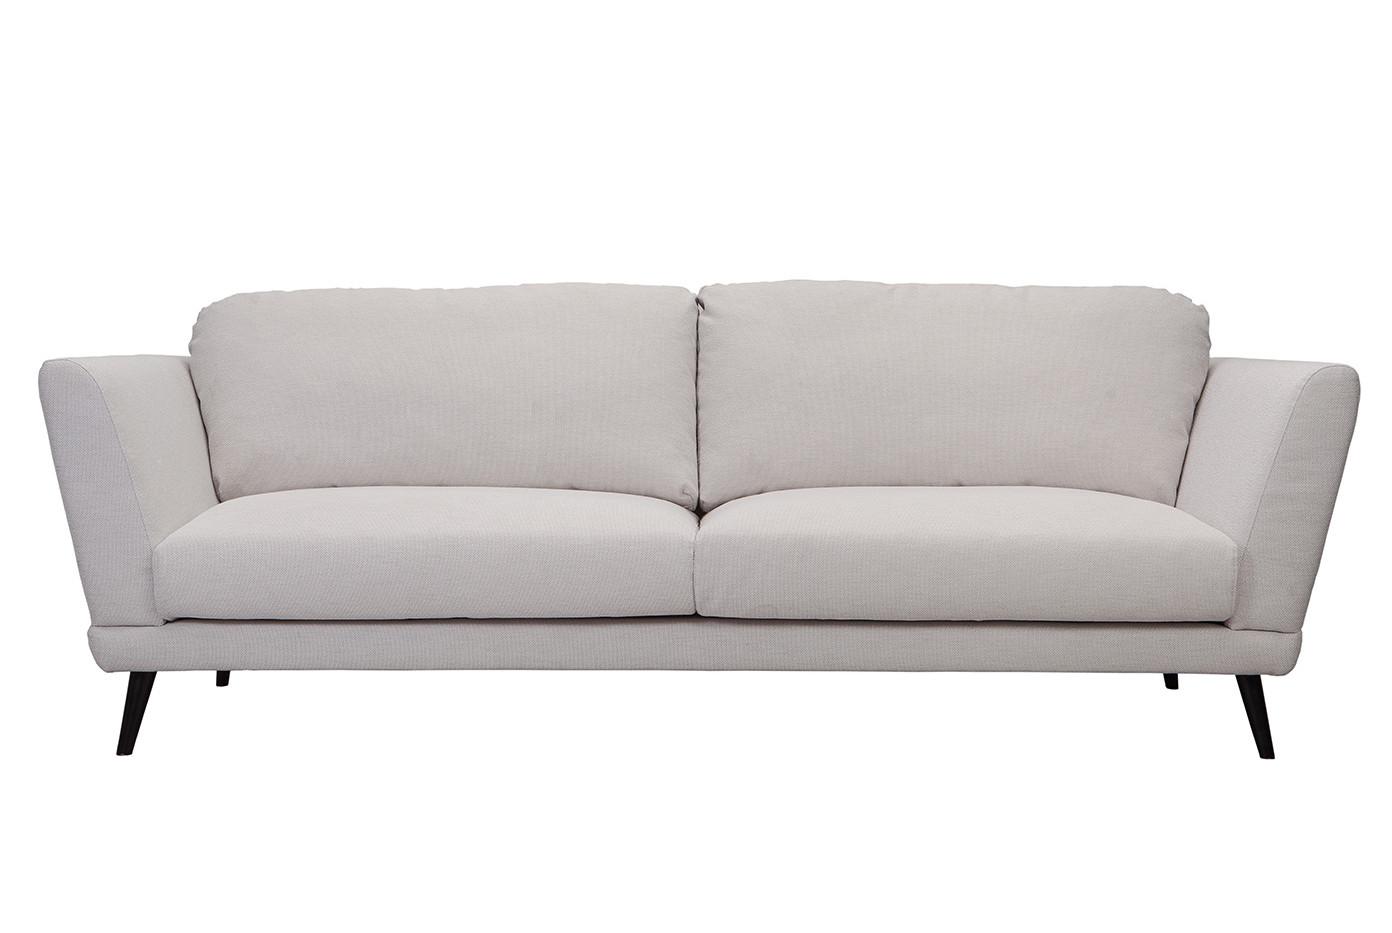 Calypso 3so Colmar white